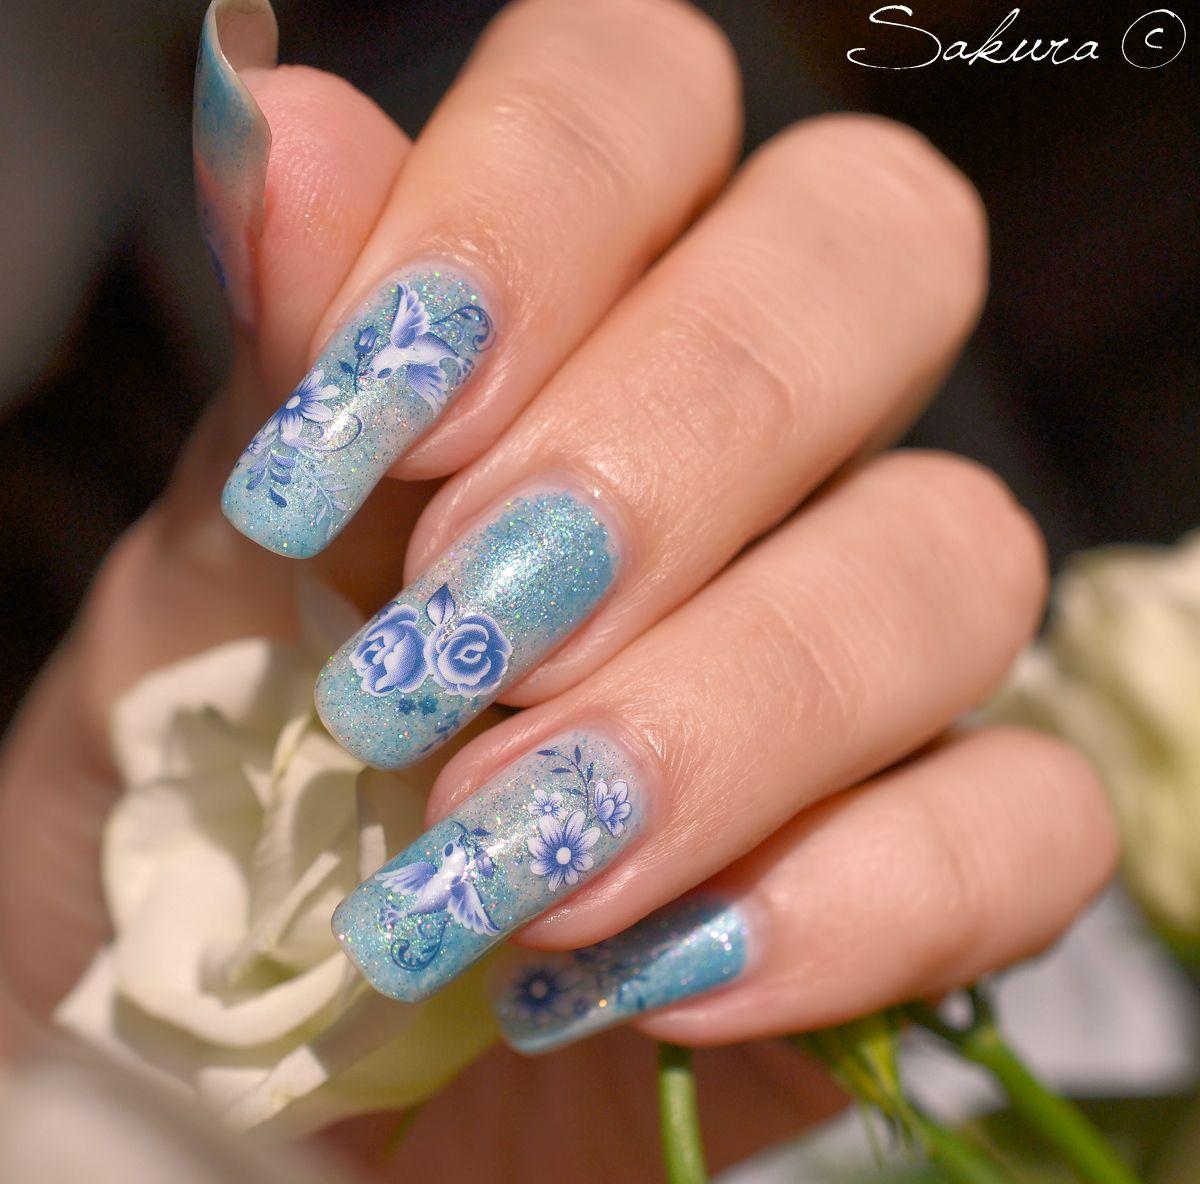 NAIL-ART-DEGRADE-HOLO-BLEU-WD | Nail Art | Pinterest | Art nails ...